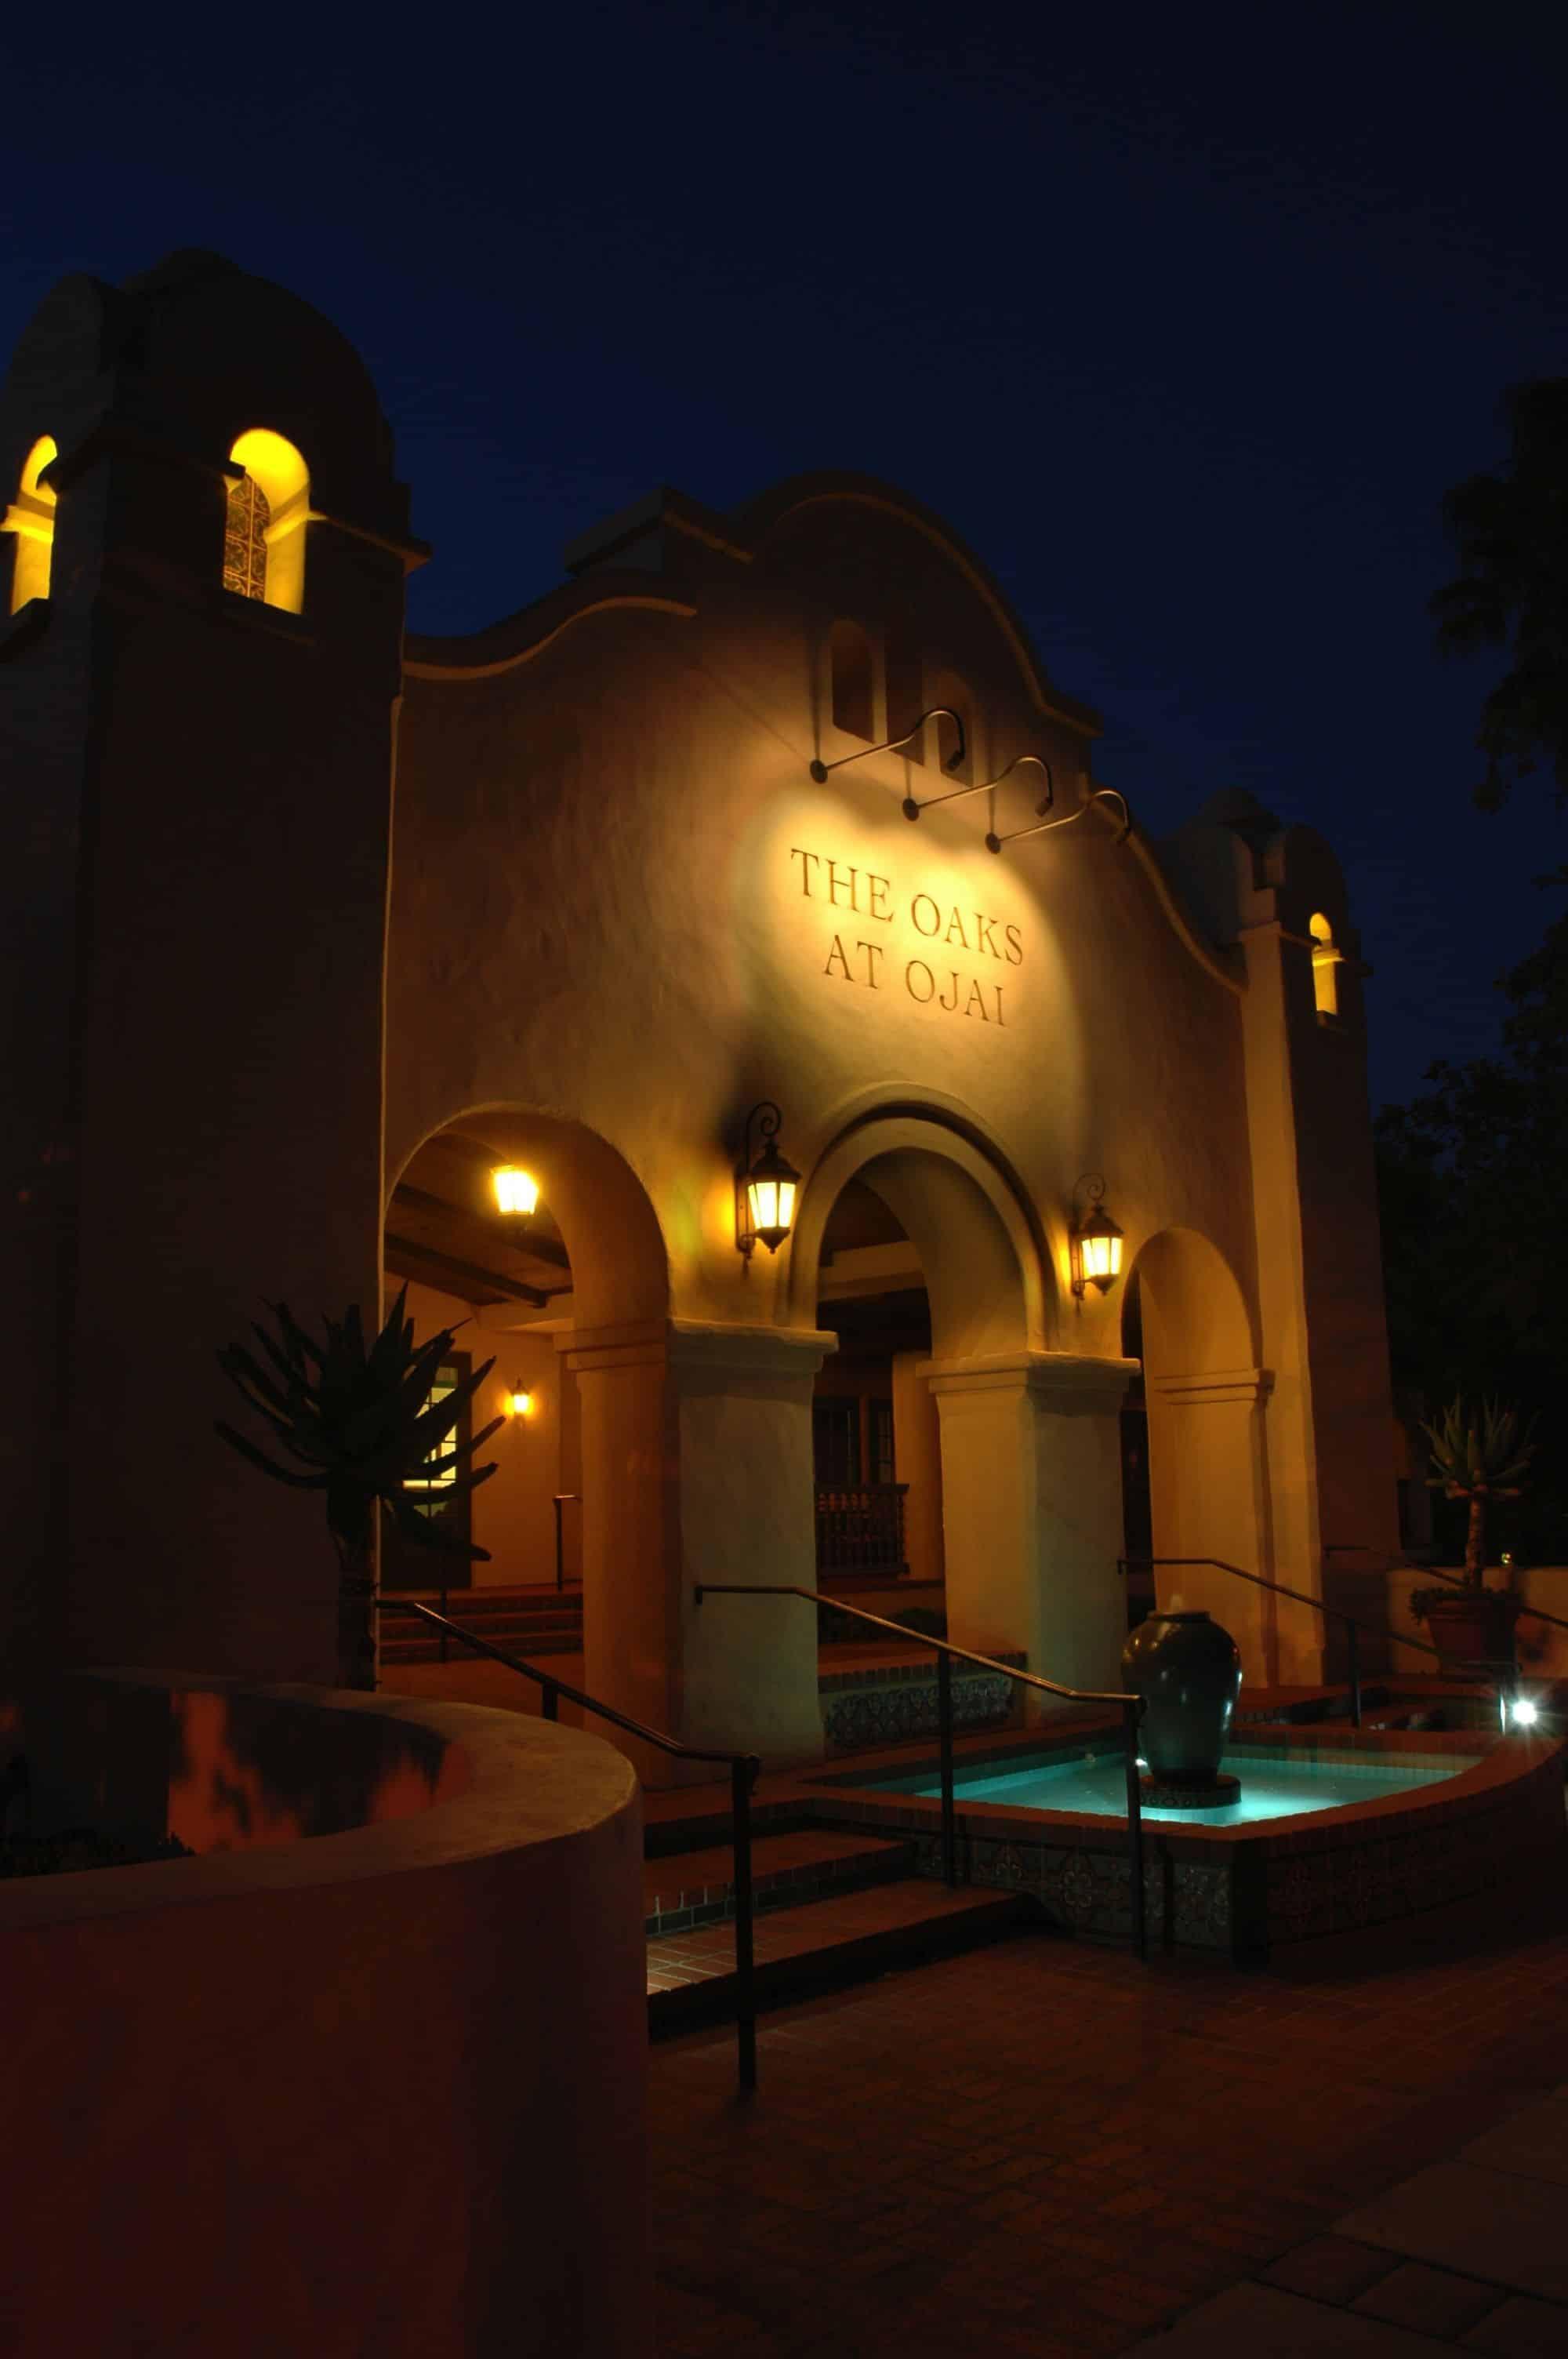 The-Oaks-at-Ojai-Exclusive-Destination-Spa-Luxury-Travel-Magazine-Oaks-Spa-Beverly-Hills-Magazine-2